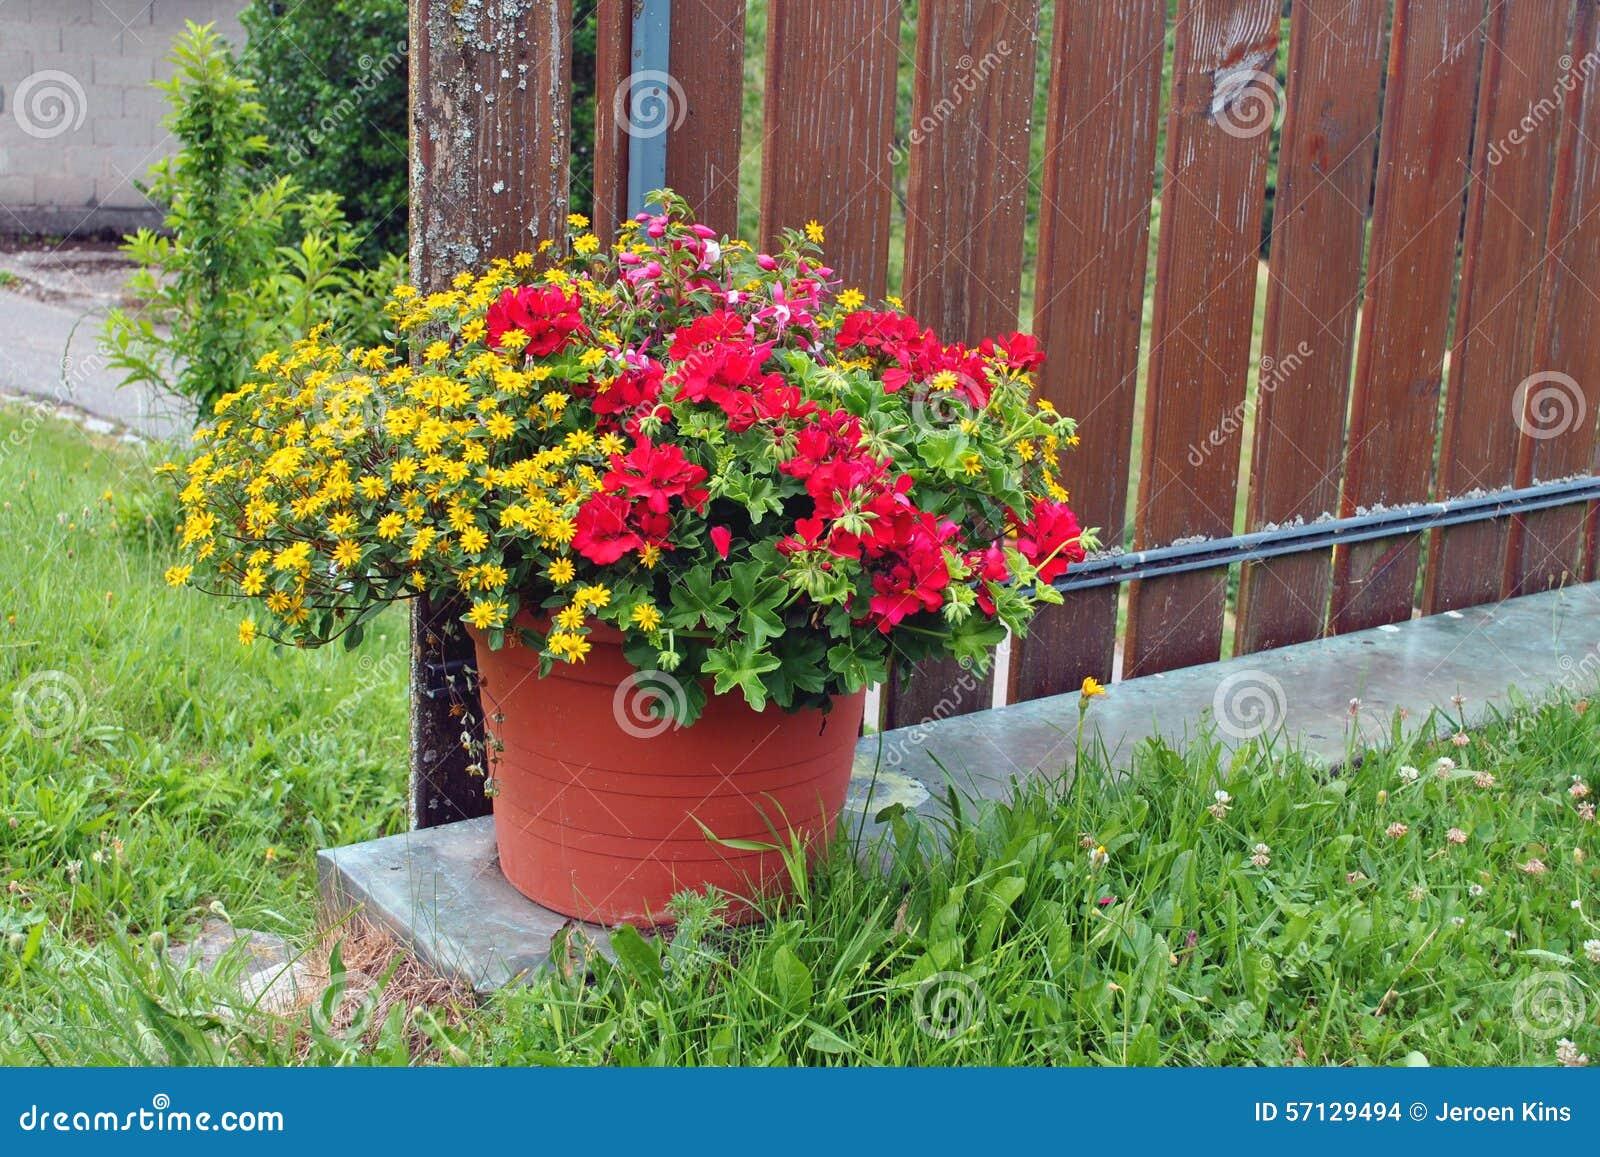 Pot With Flowers Geranium Sanvitalia And Fuchsia Stock Photo